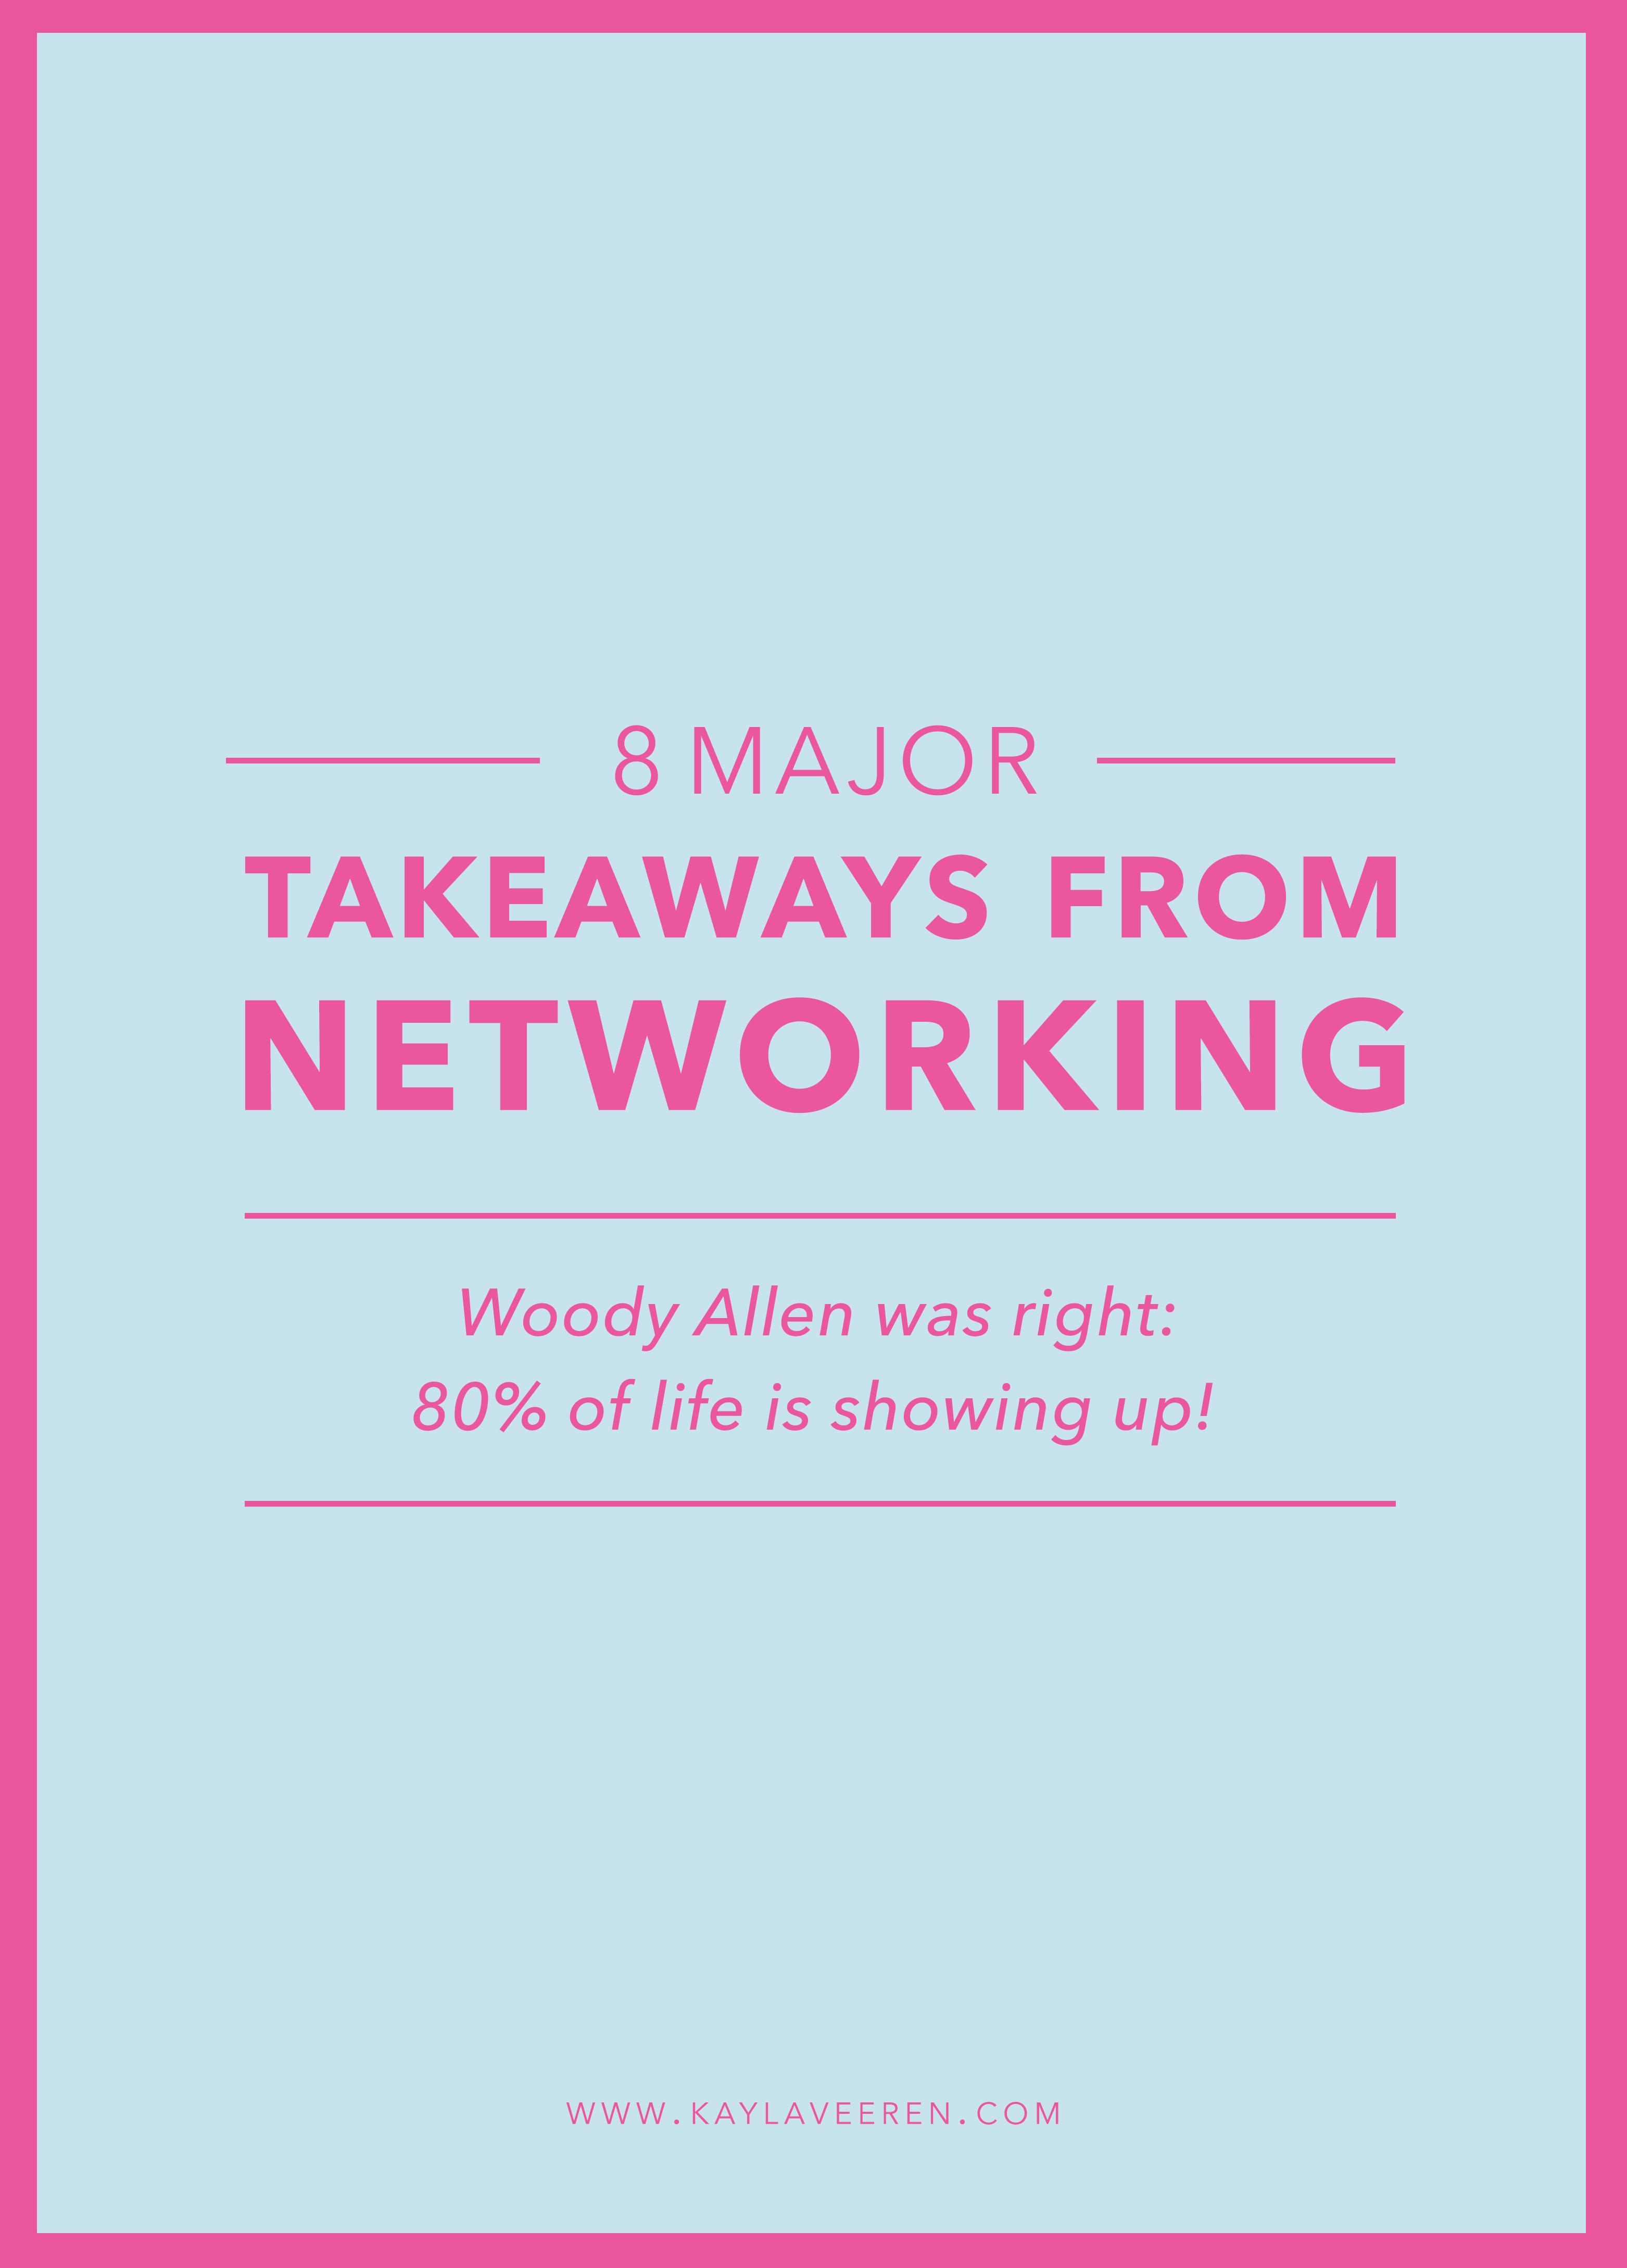 takeaways-from-networking